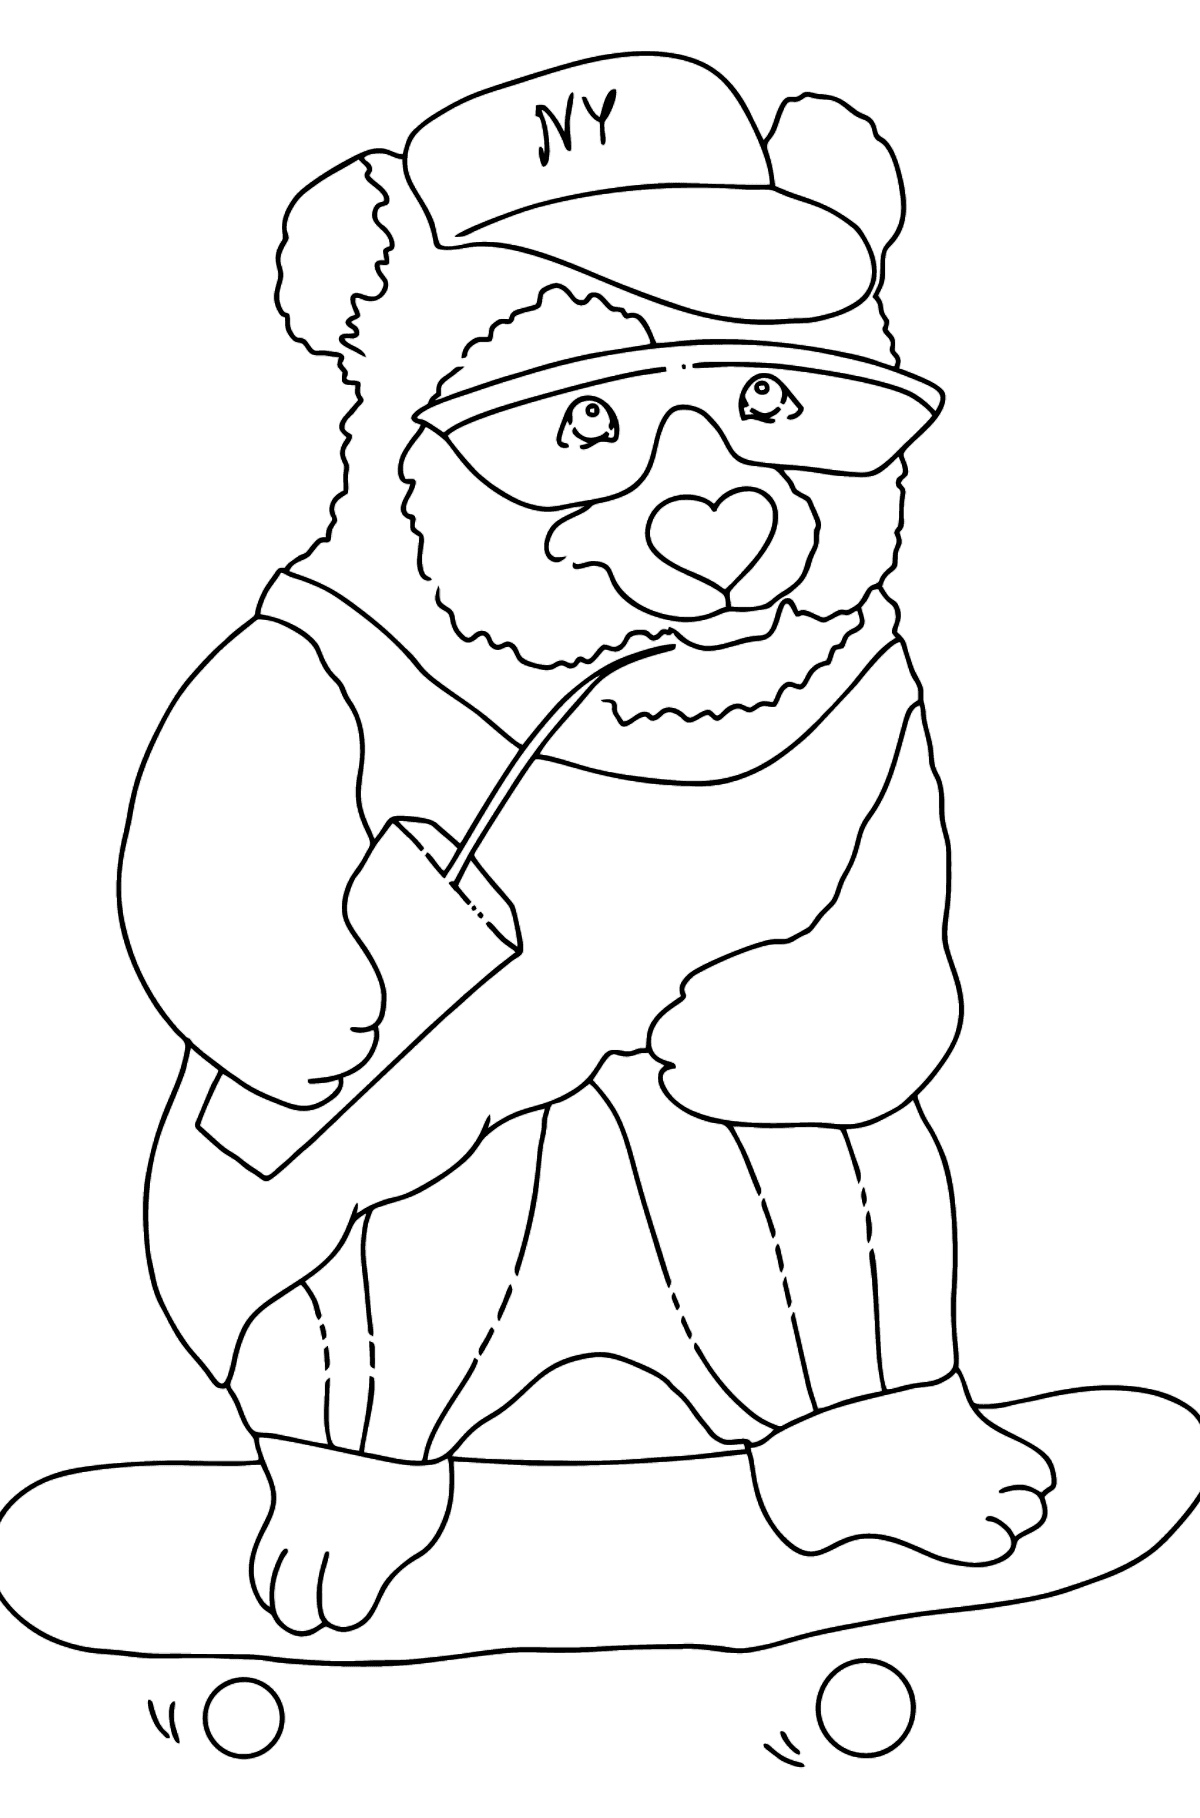 Раскраска Панда на скейтборде - Картинки для Детей